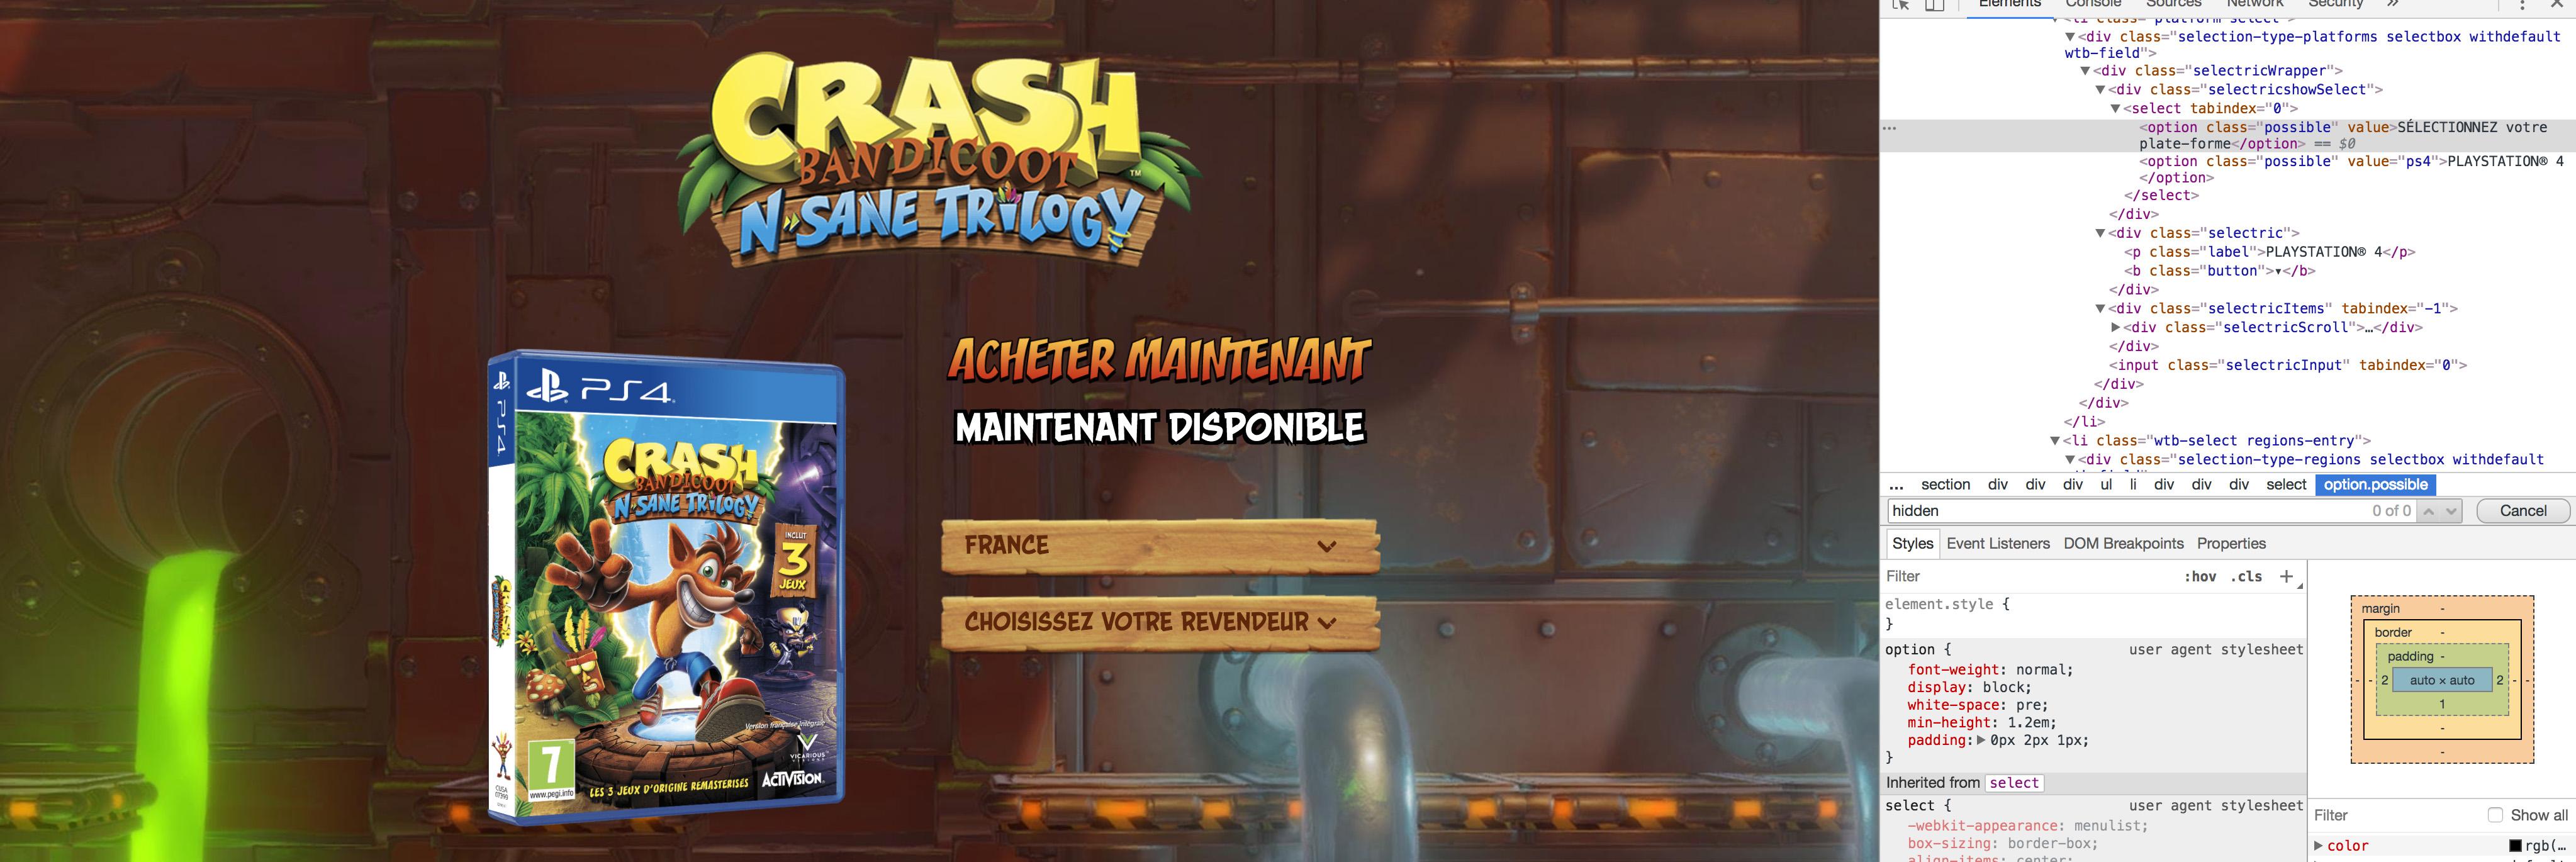 CrashBandicootN.SaneTrilogy PS4 Div 020